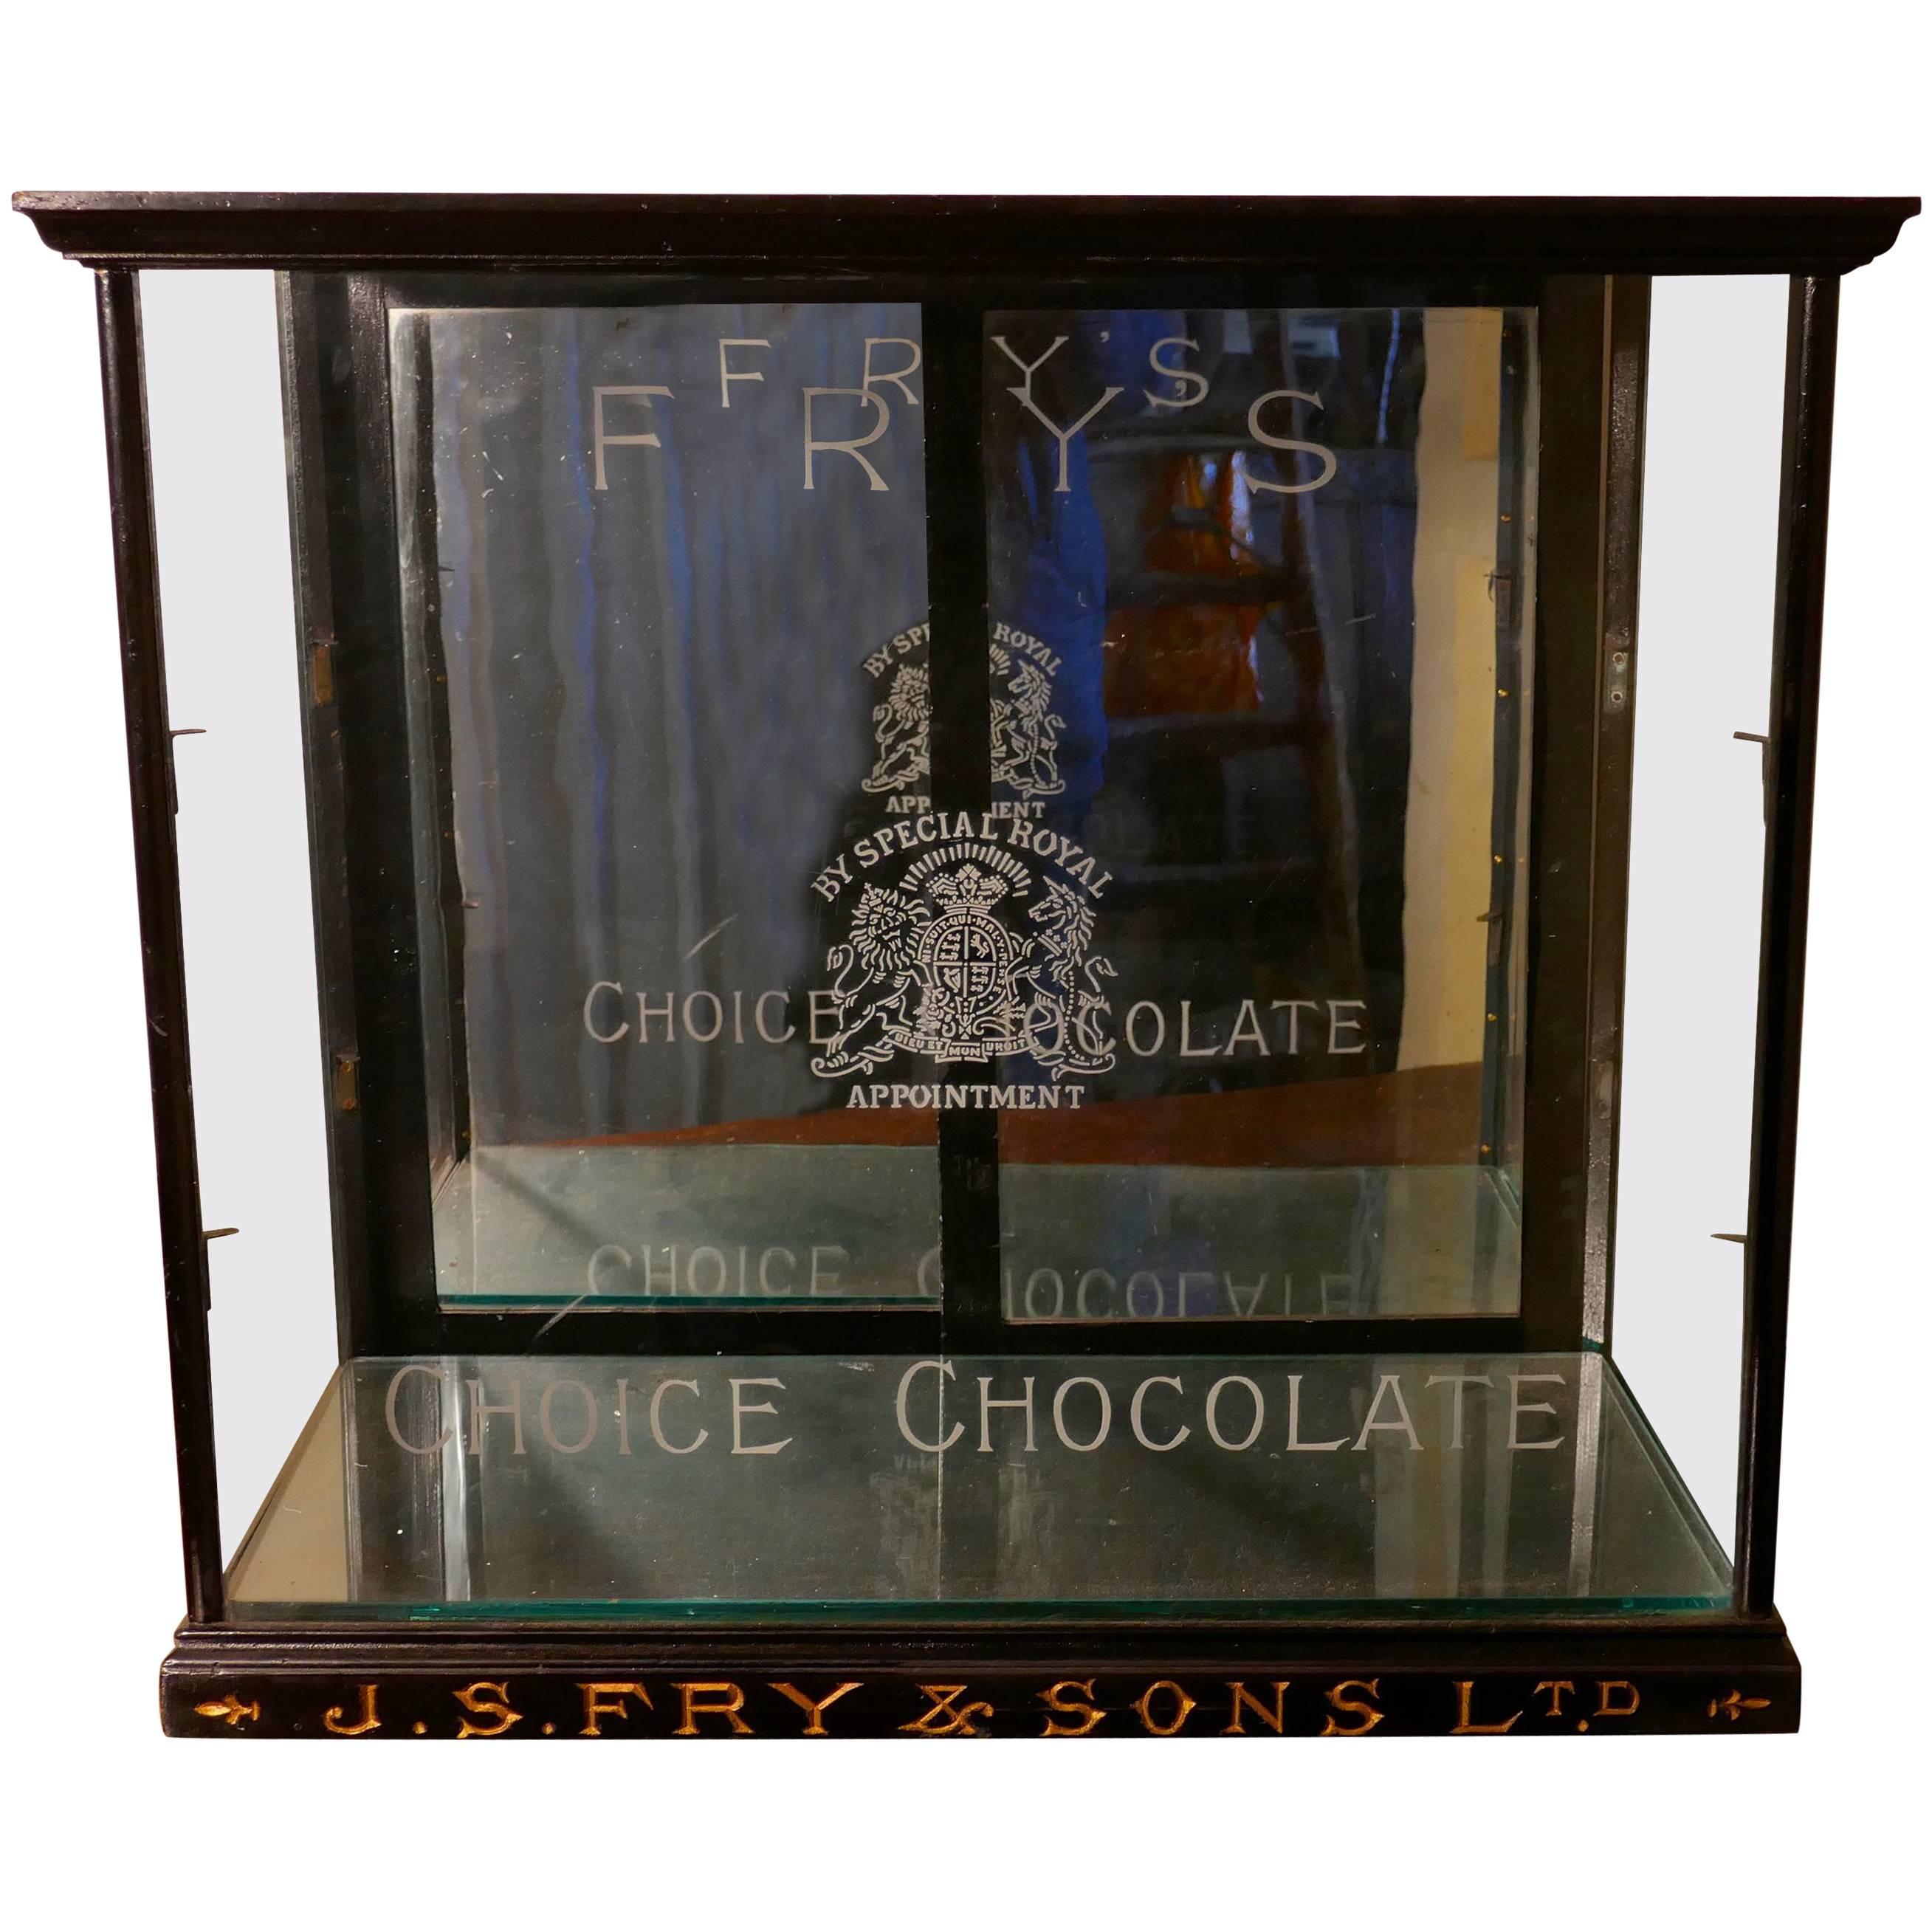 Fryu0027s Glazed Sweet Shop Display Cabinet For Sale